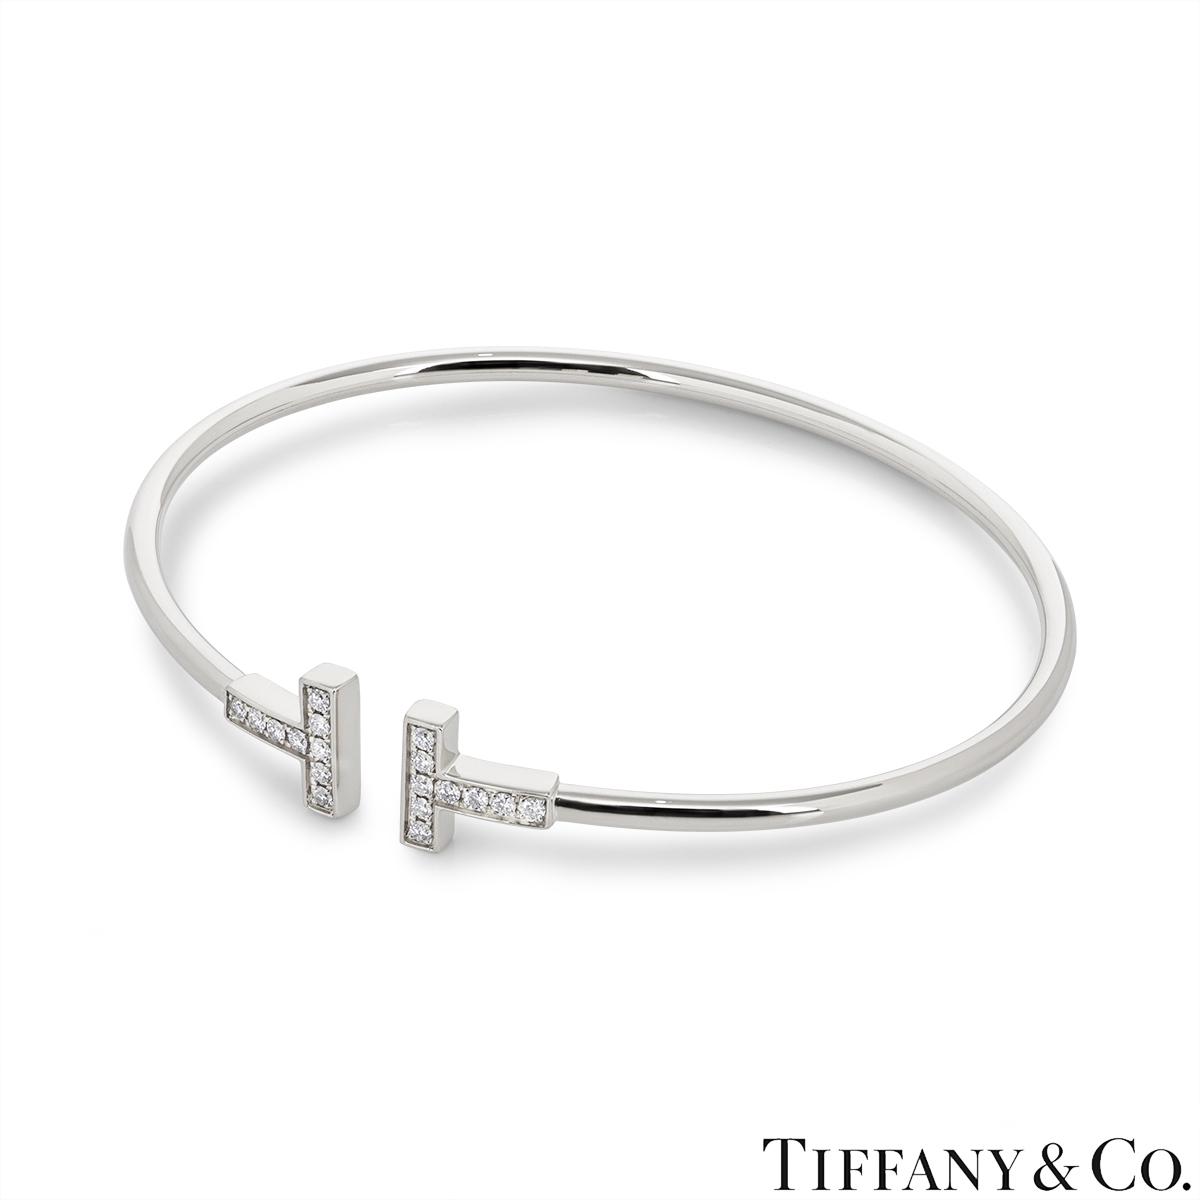 Tiffany & Co. White Gold Tiffany T Diamond Bracelet